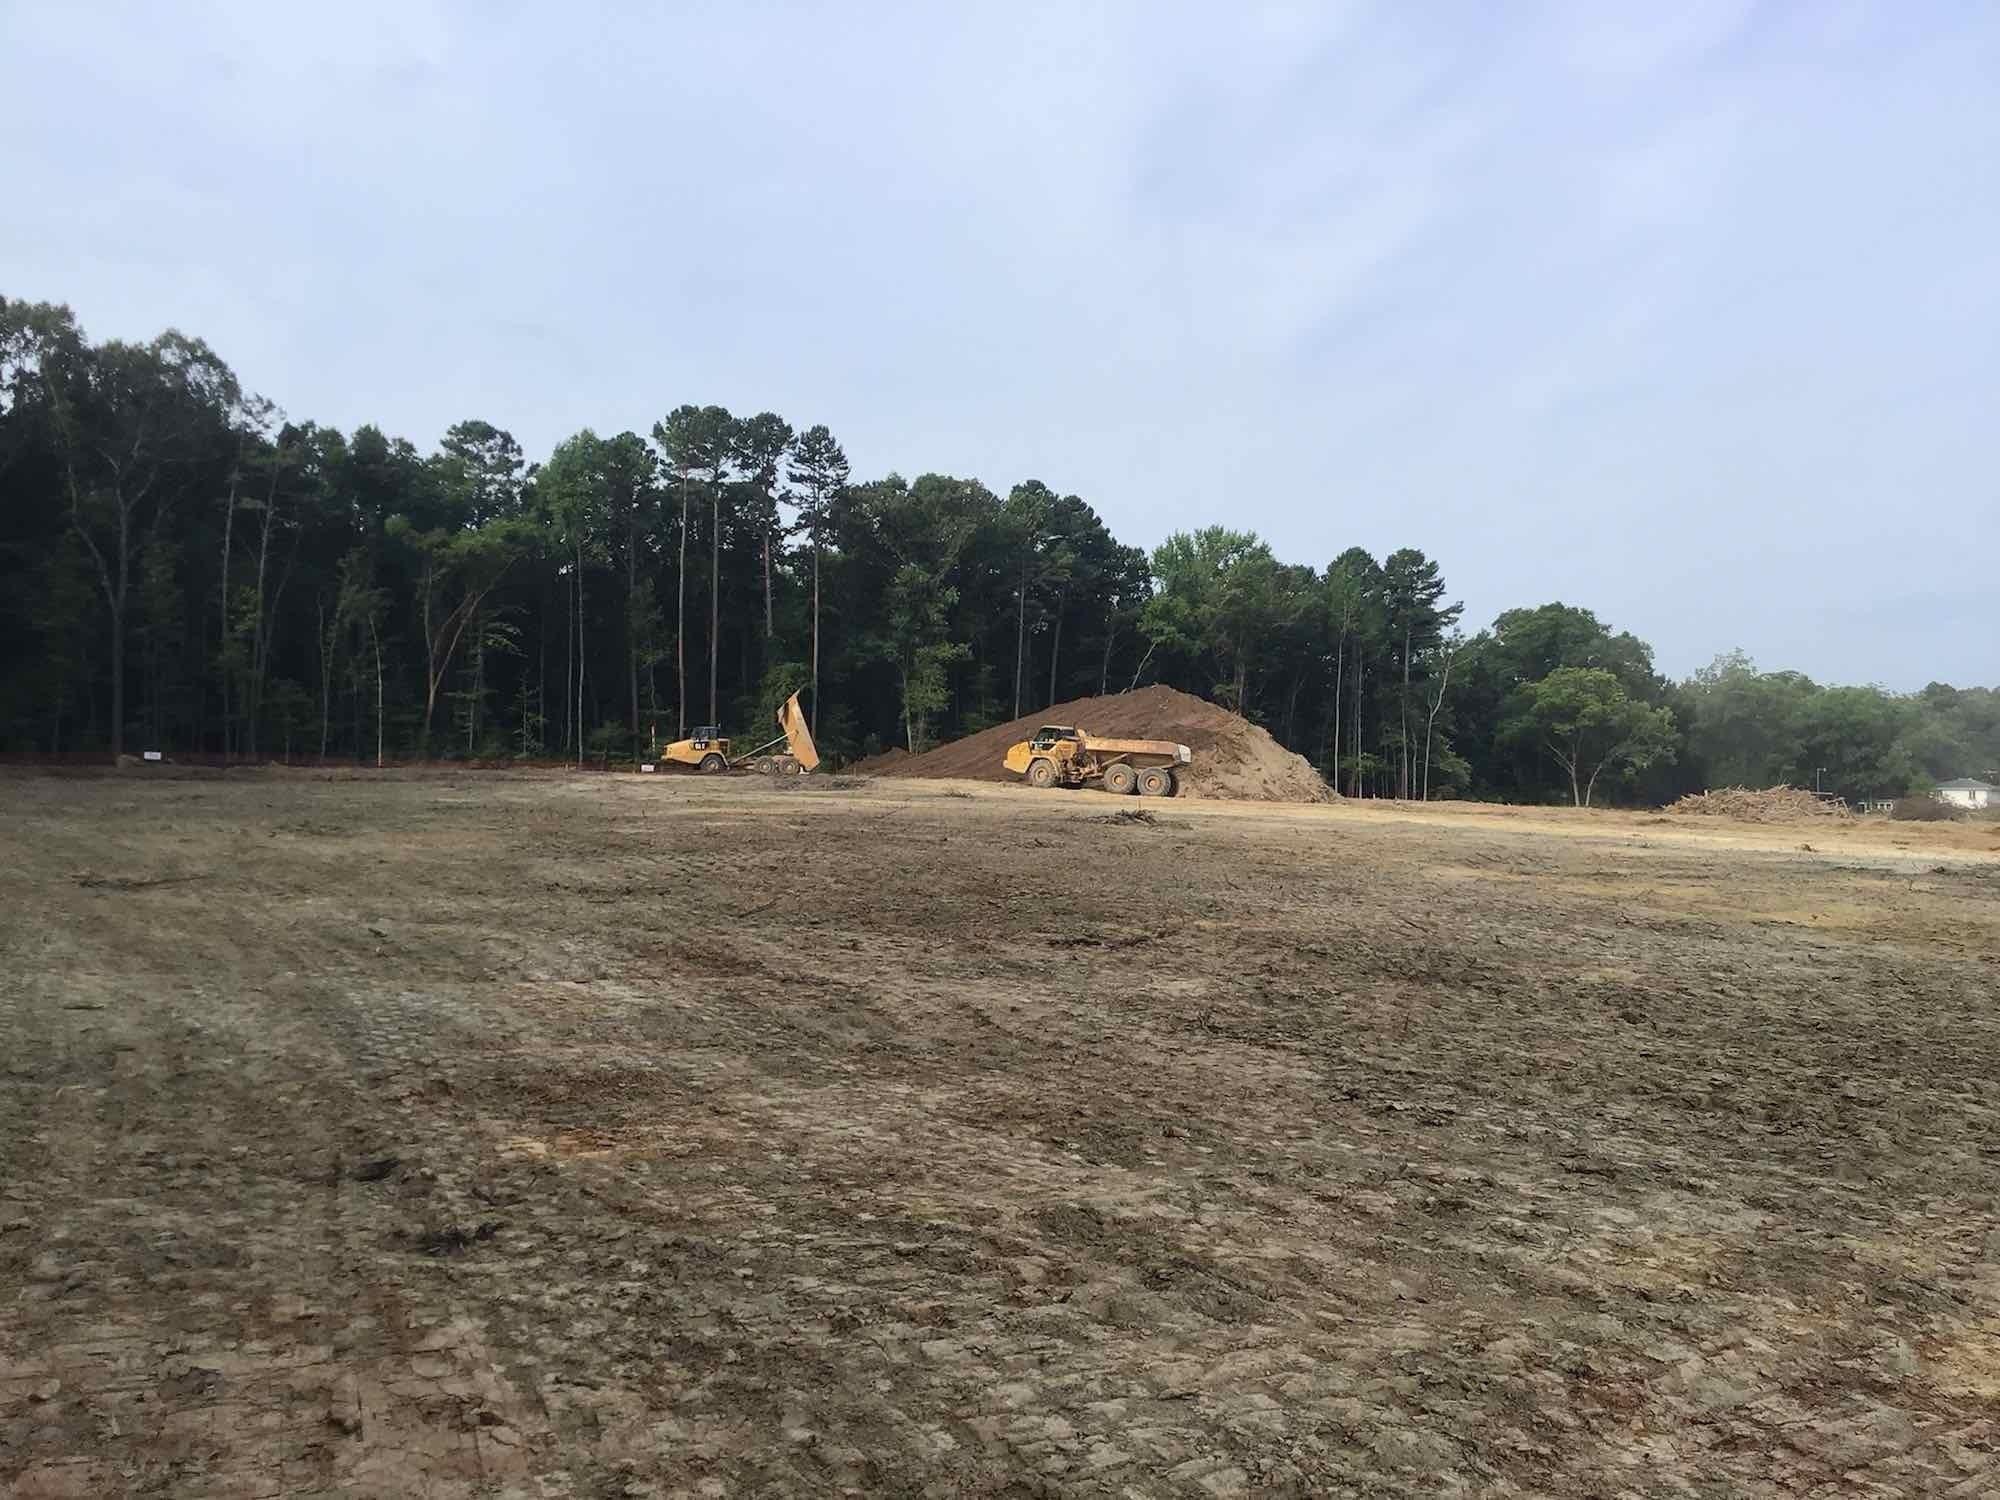 Northern High School Site - July 2021